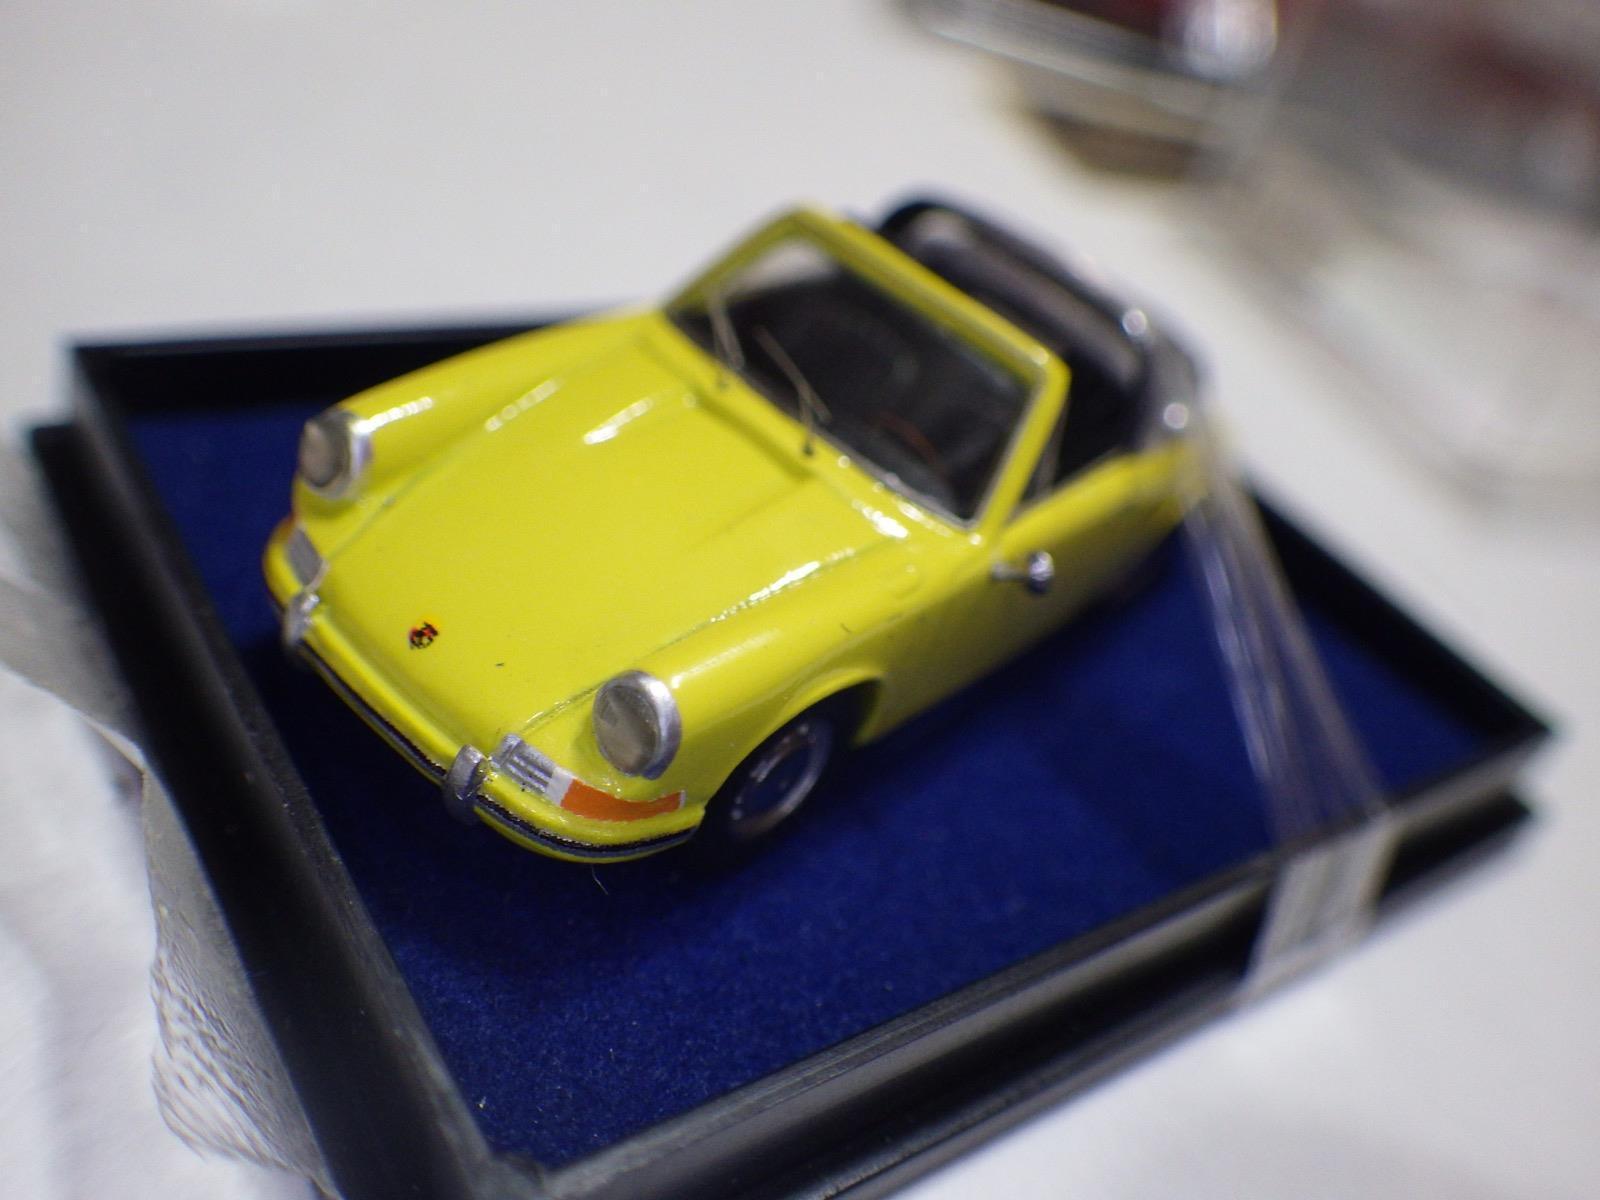 High Tech Modell (Germany) Yellow Porsche 911 Targa 1968-70 Diecast 1 87 NIB